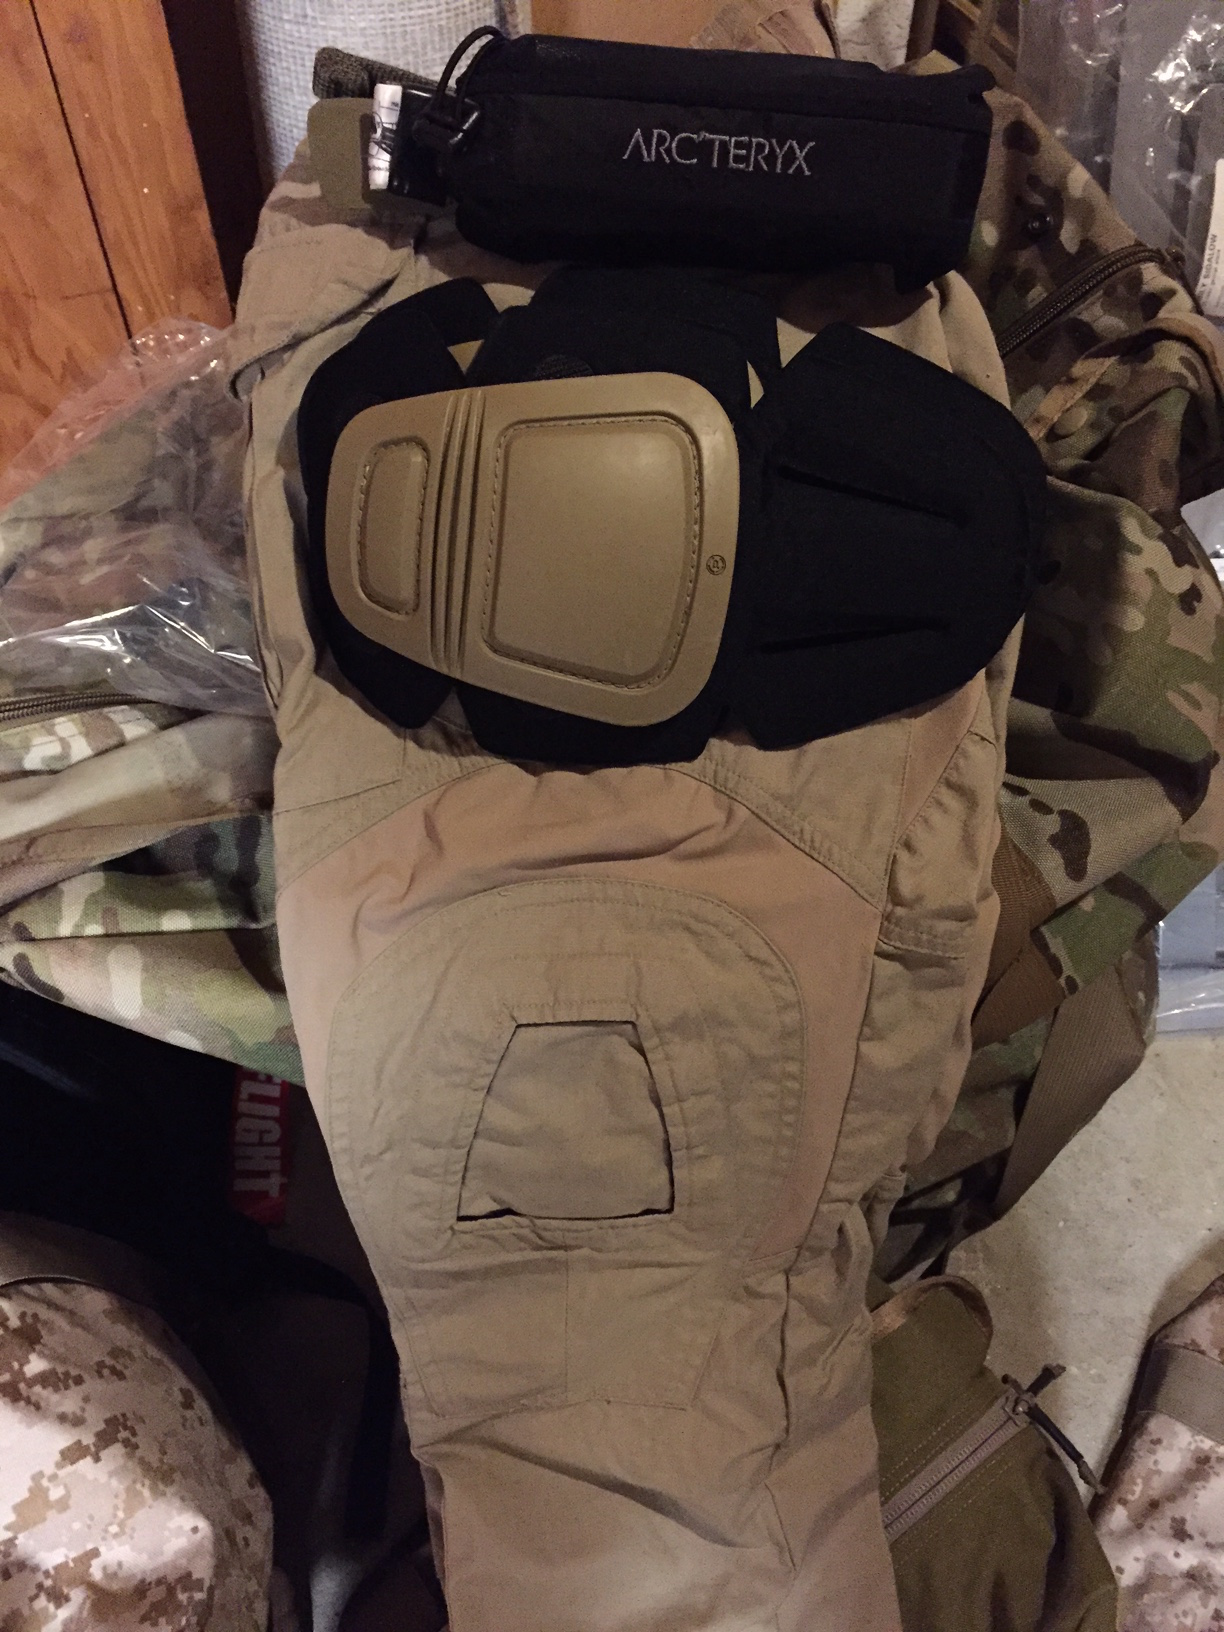 Crye G3 pants and kneepads. Arc;teryx LEAF belt